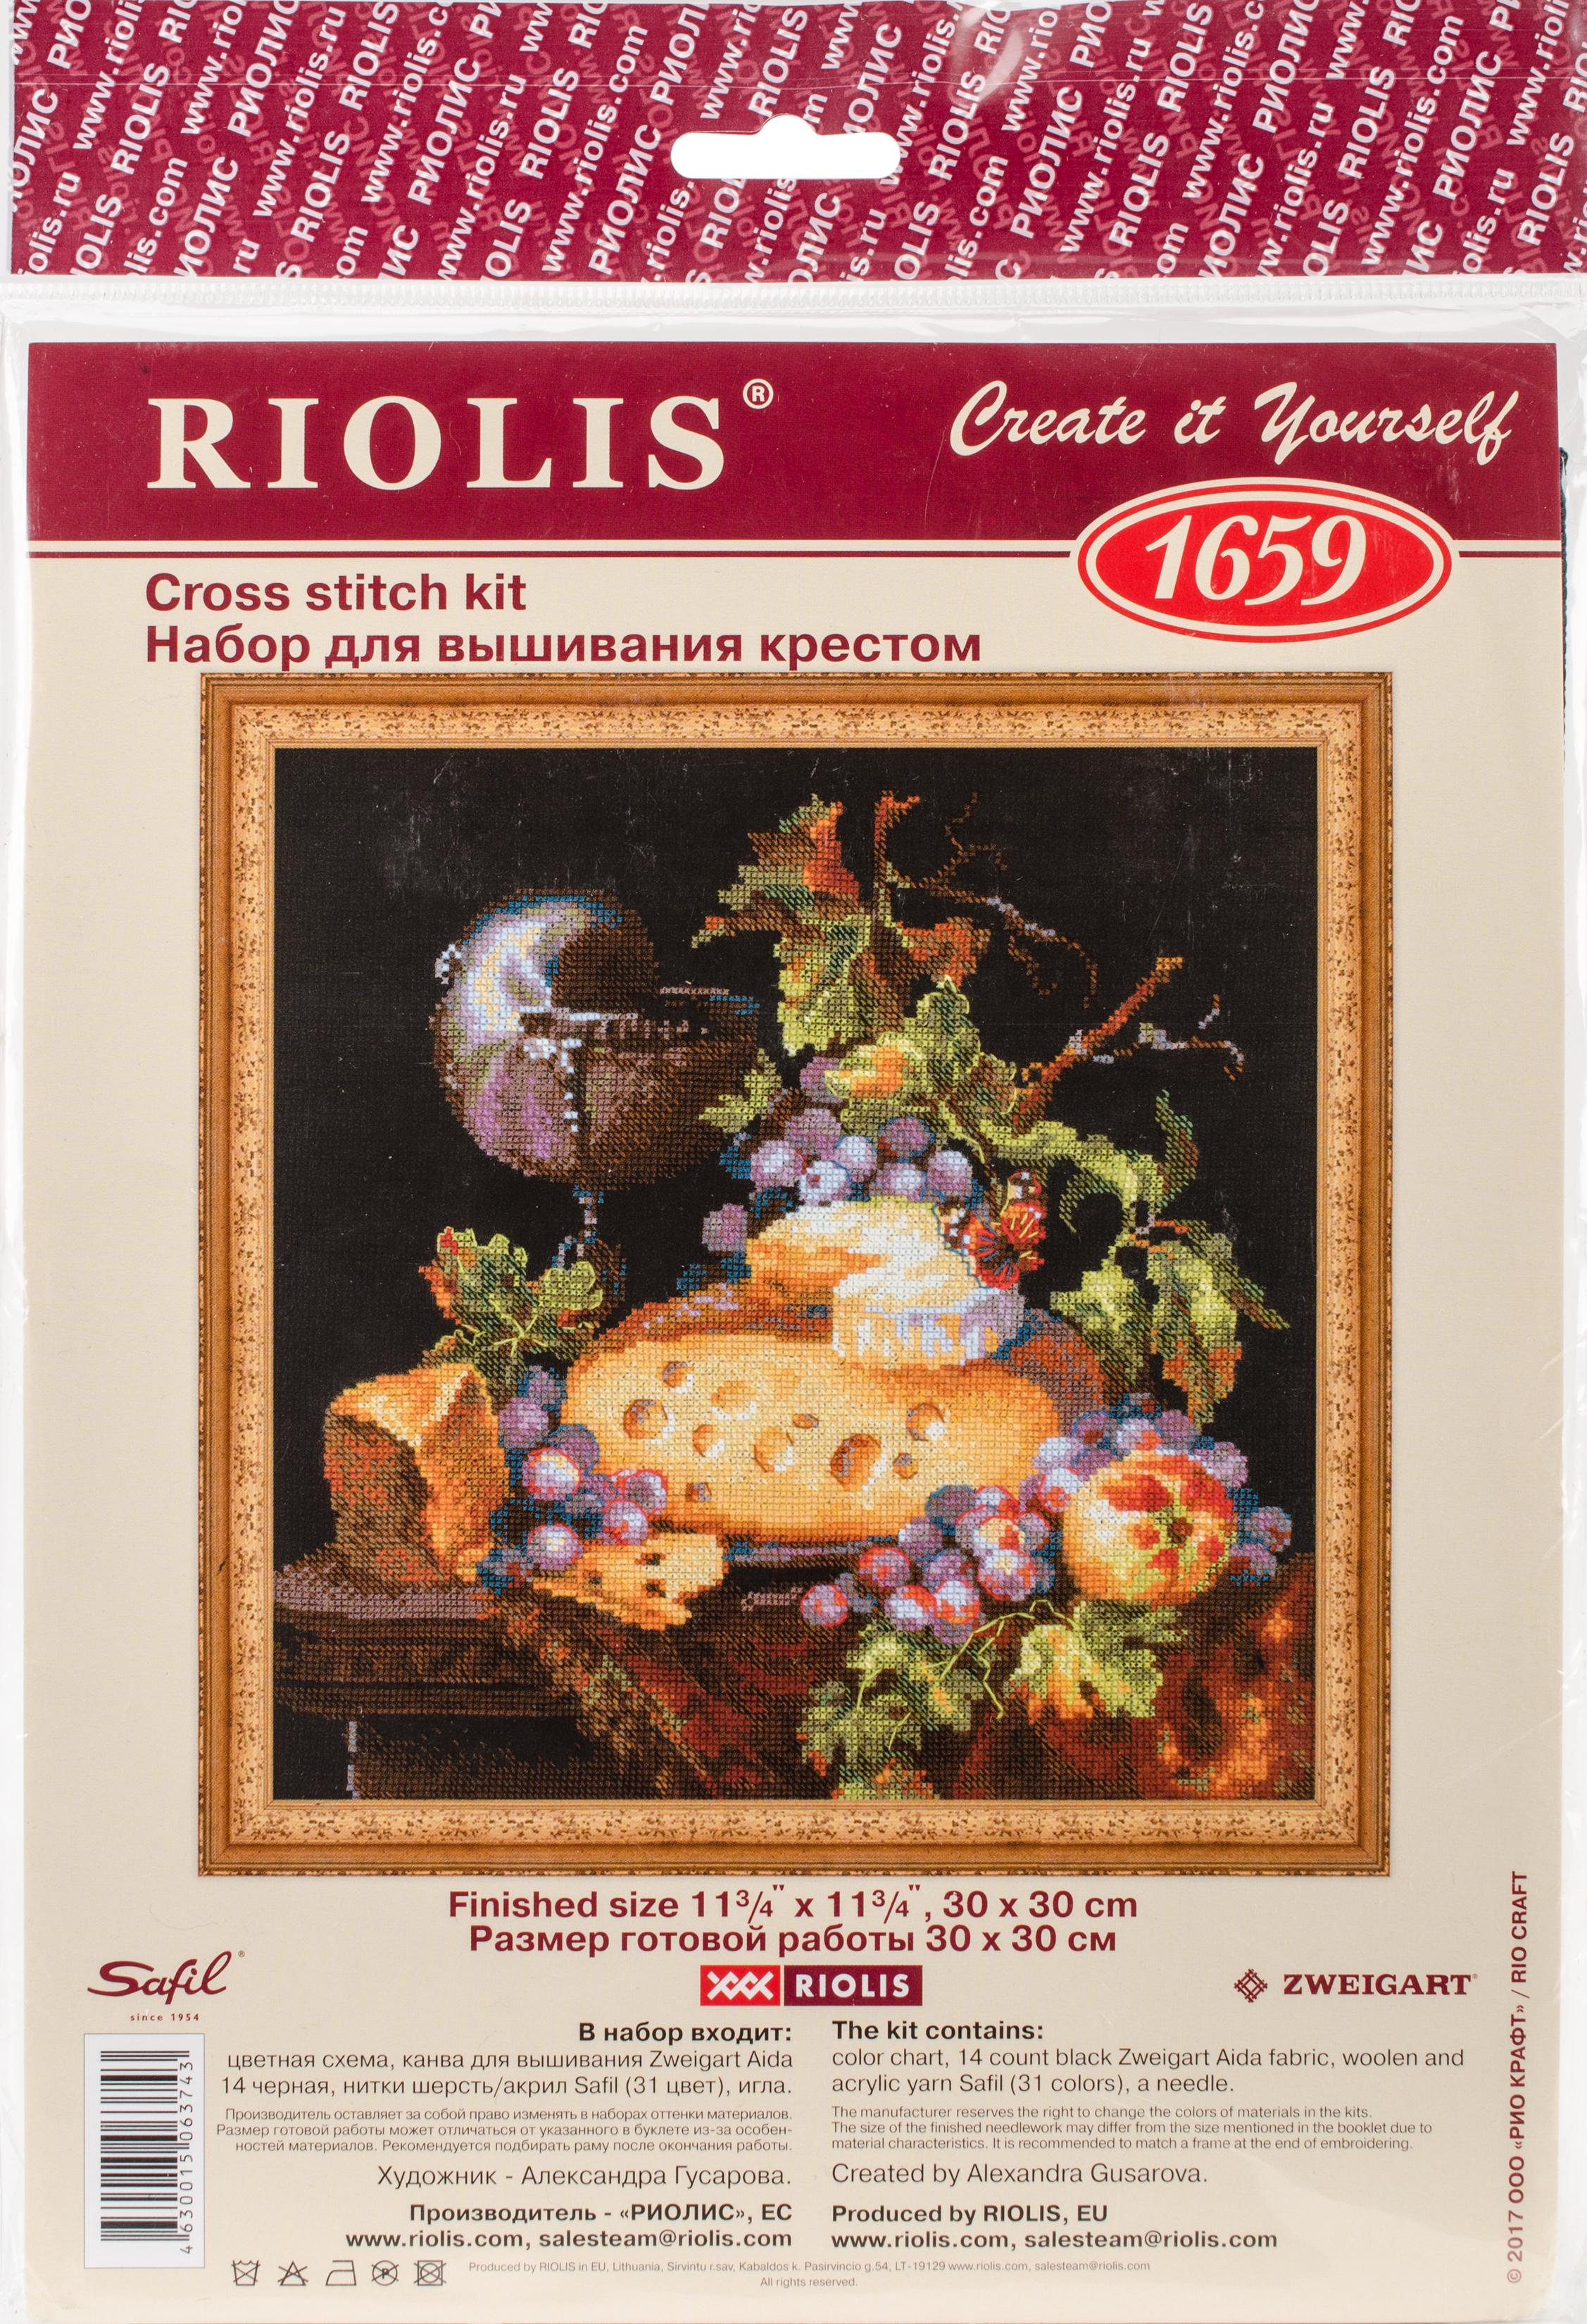 Dutch Still Life Counted Cross Stitch Kit -  RIOLIS, R1659